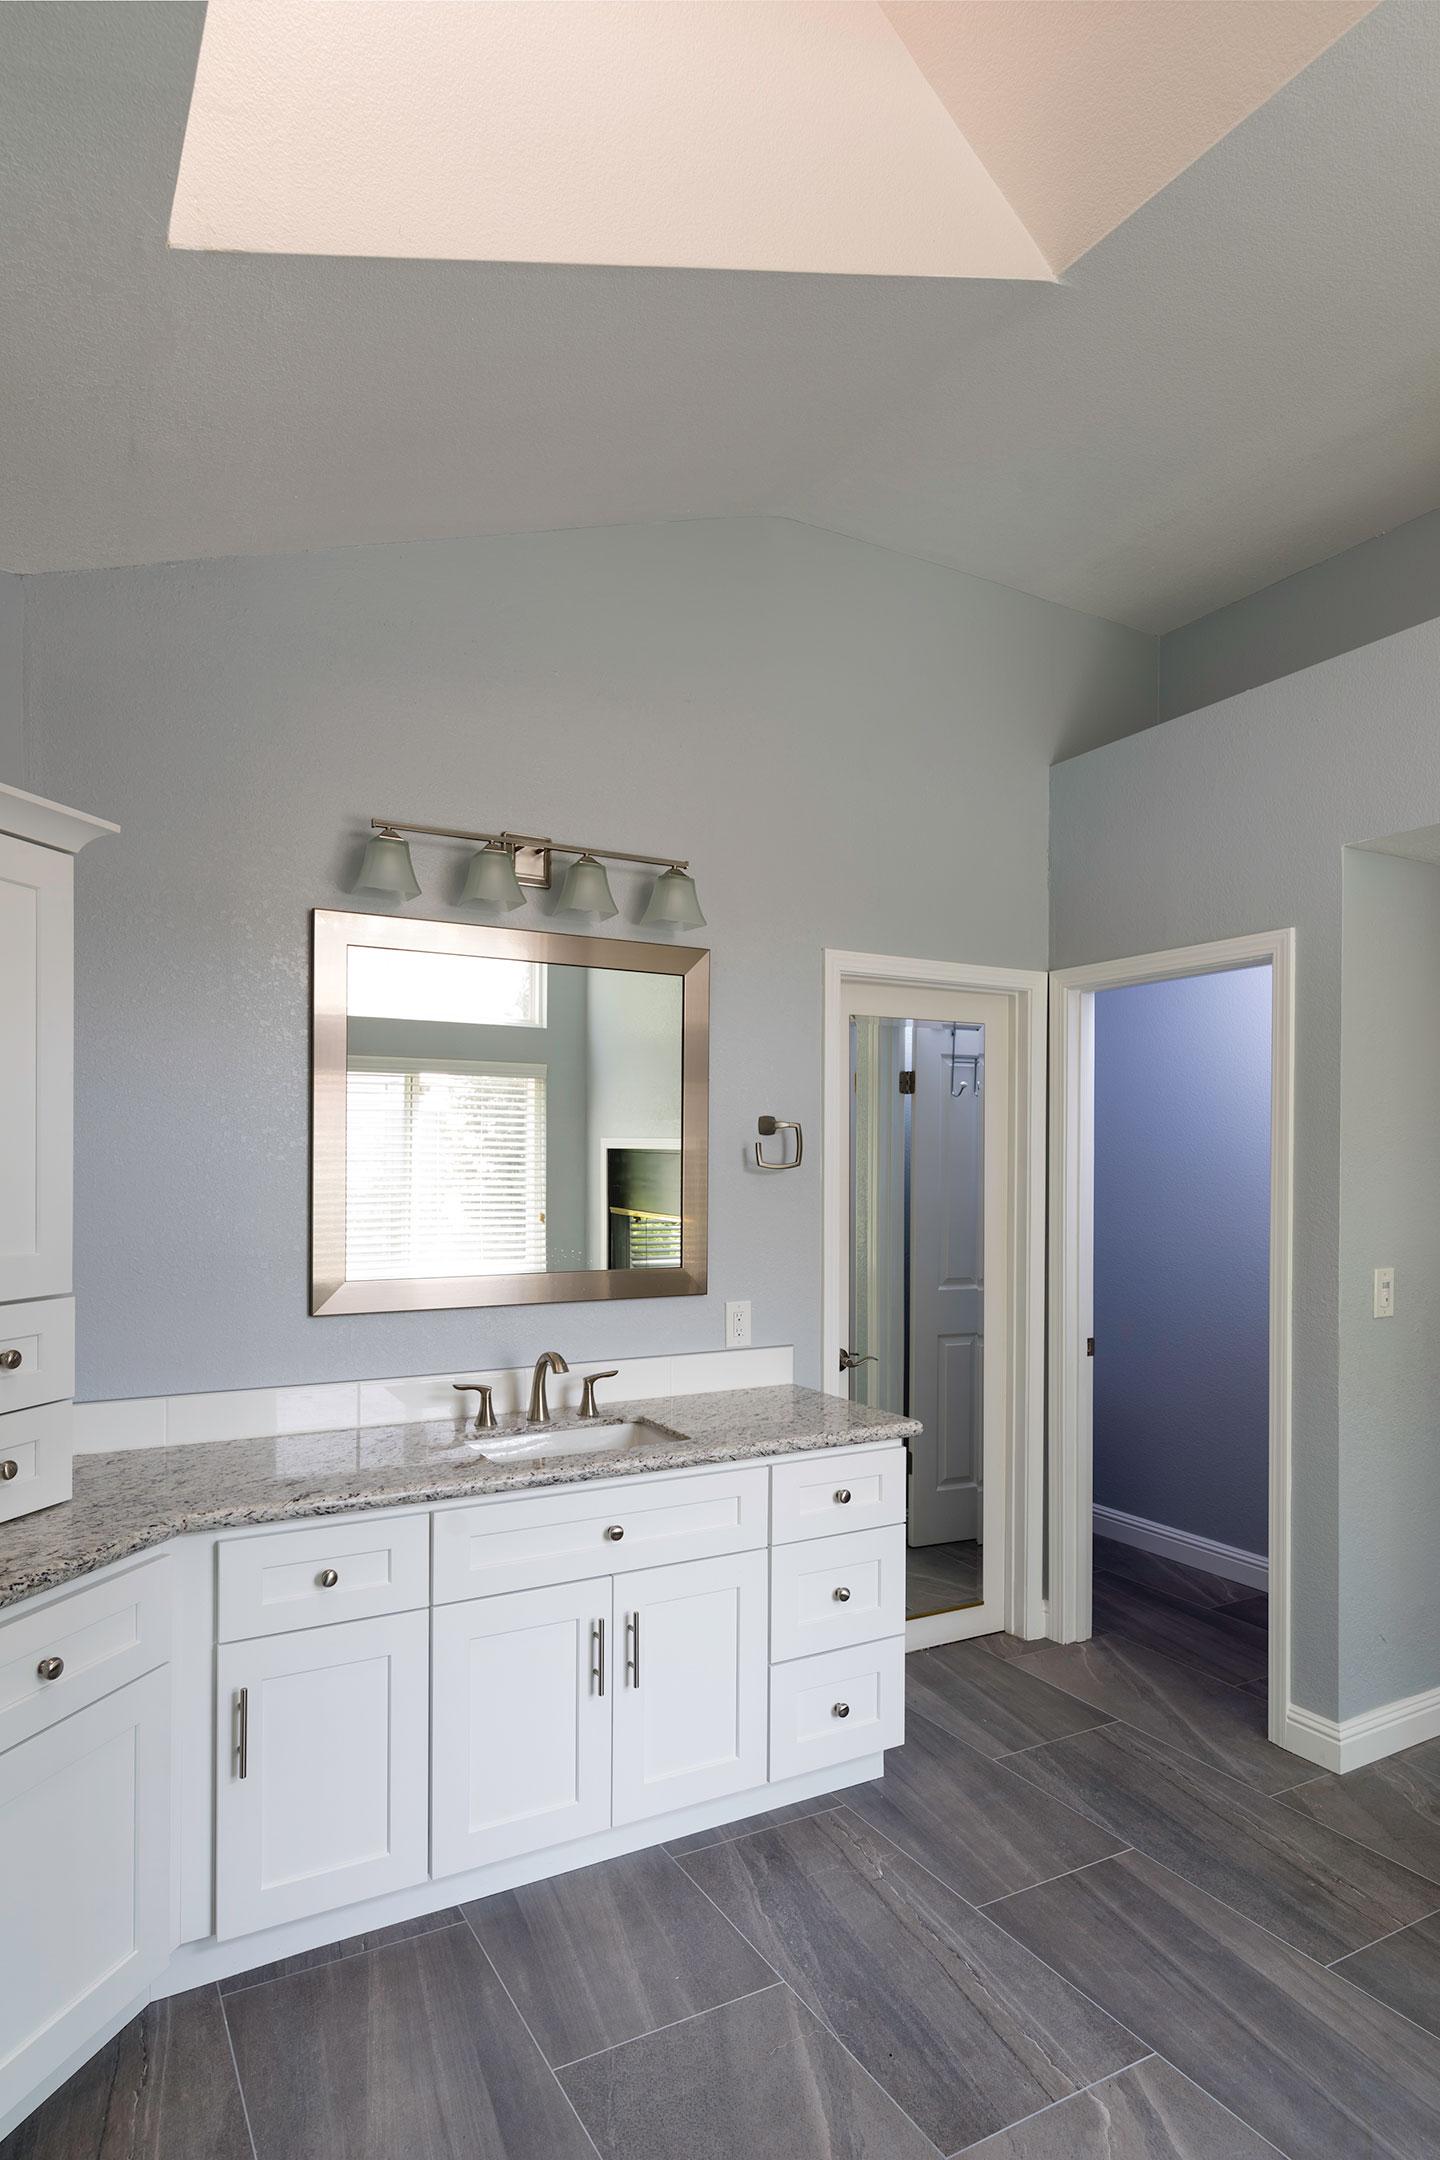 Clayton bathroom overview with skylight overhead